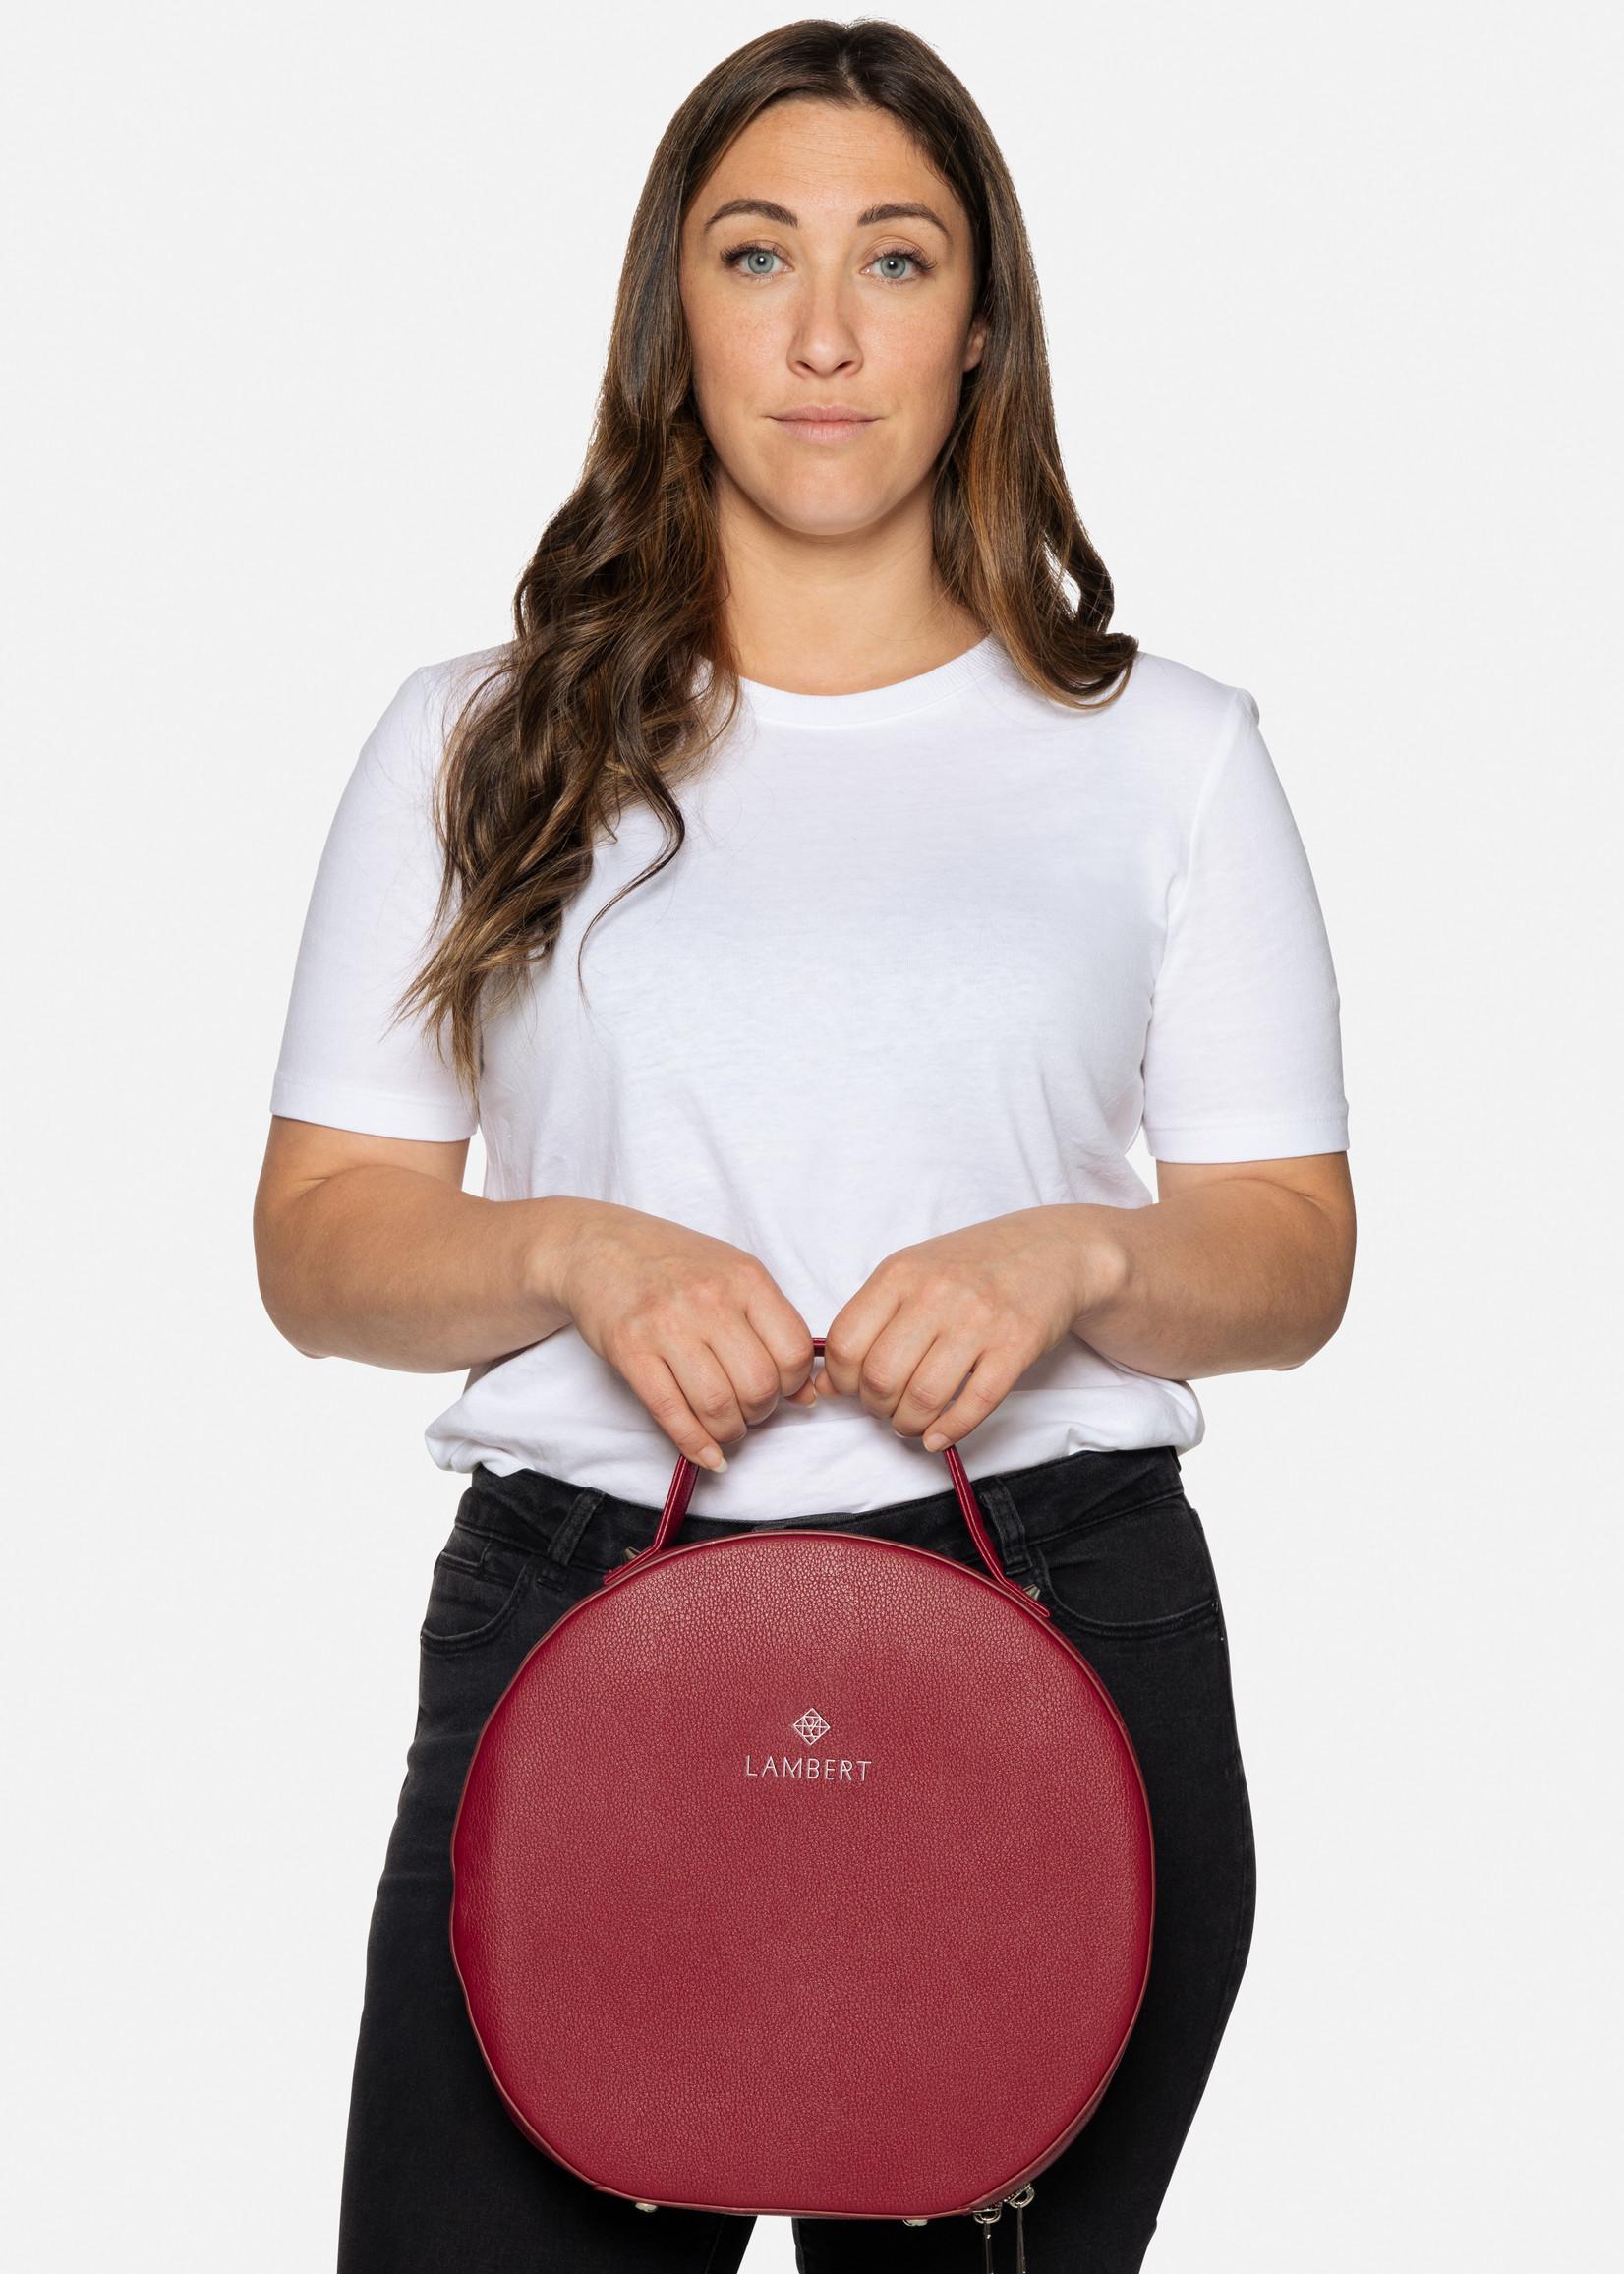 Lambert The OLIVIA Lambert Vegan Leather Multifunctional Bag